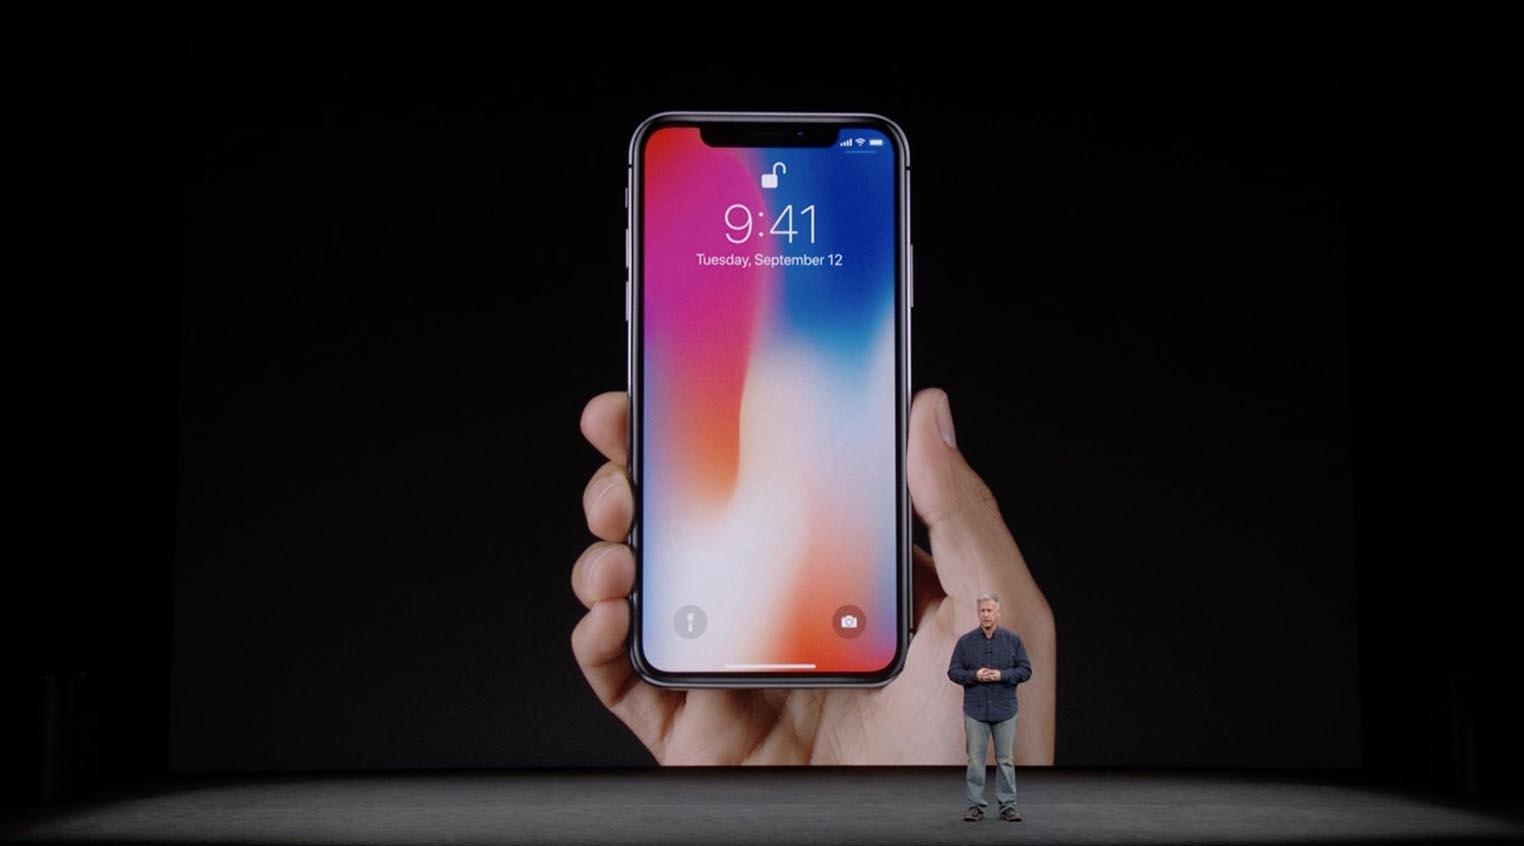 iPhone X keynote